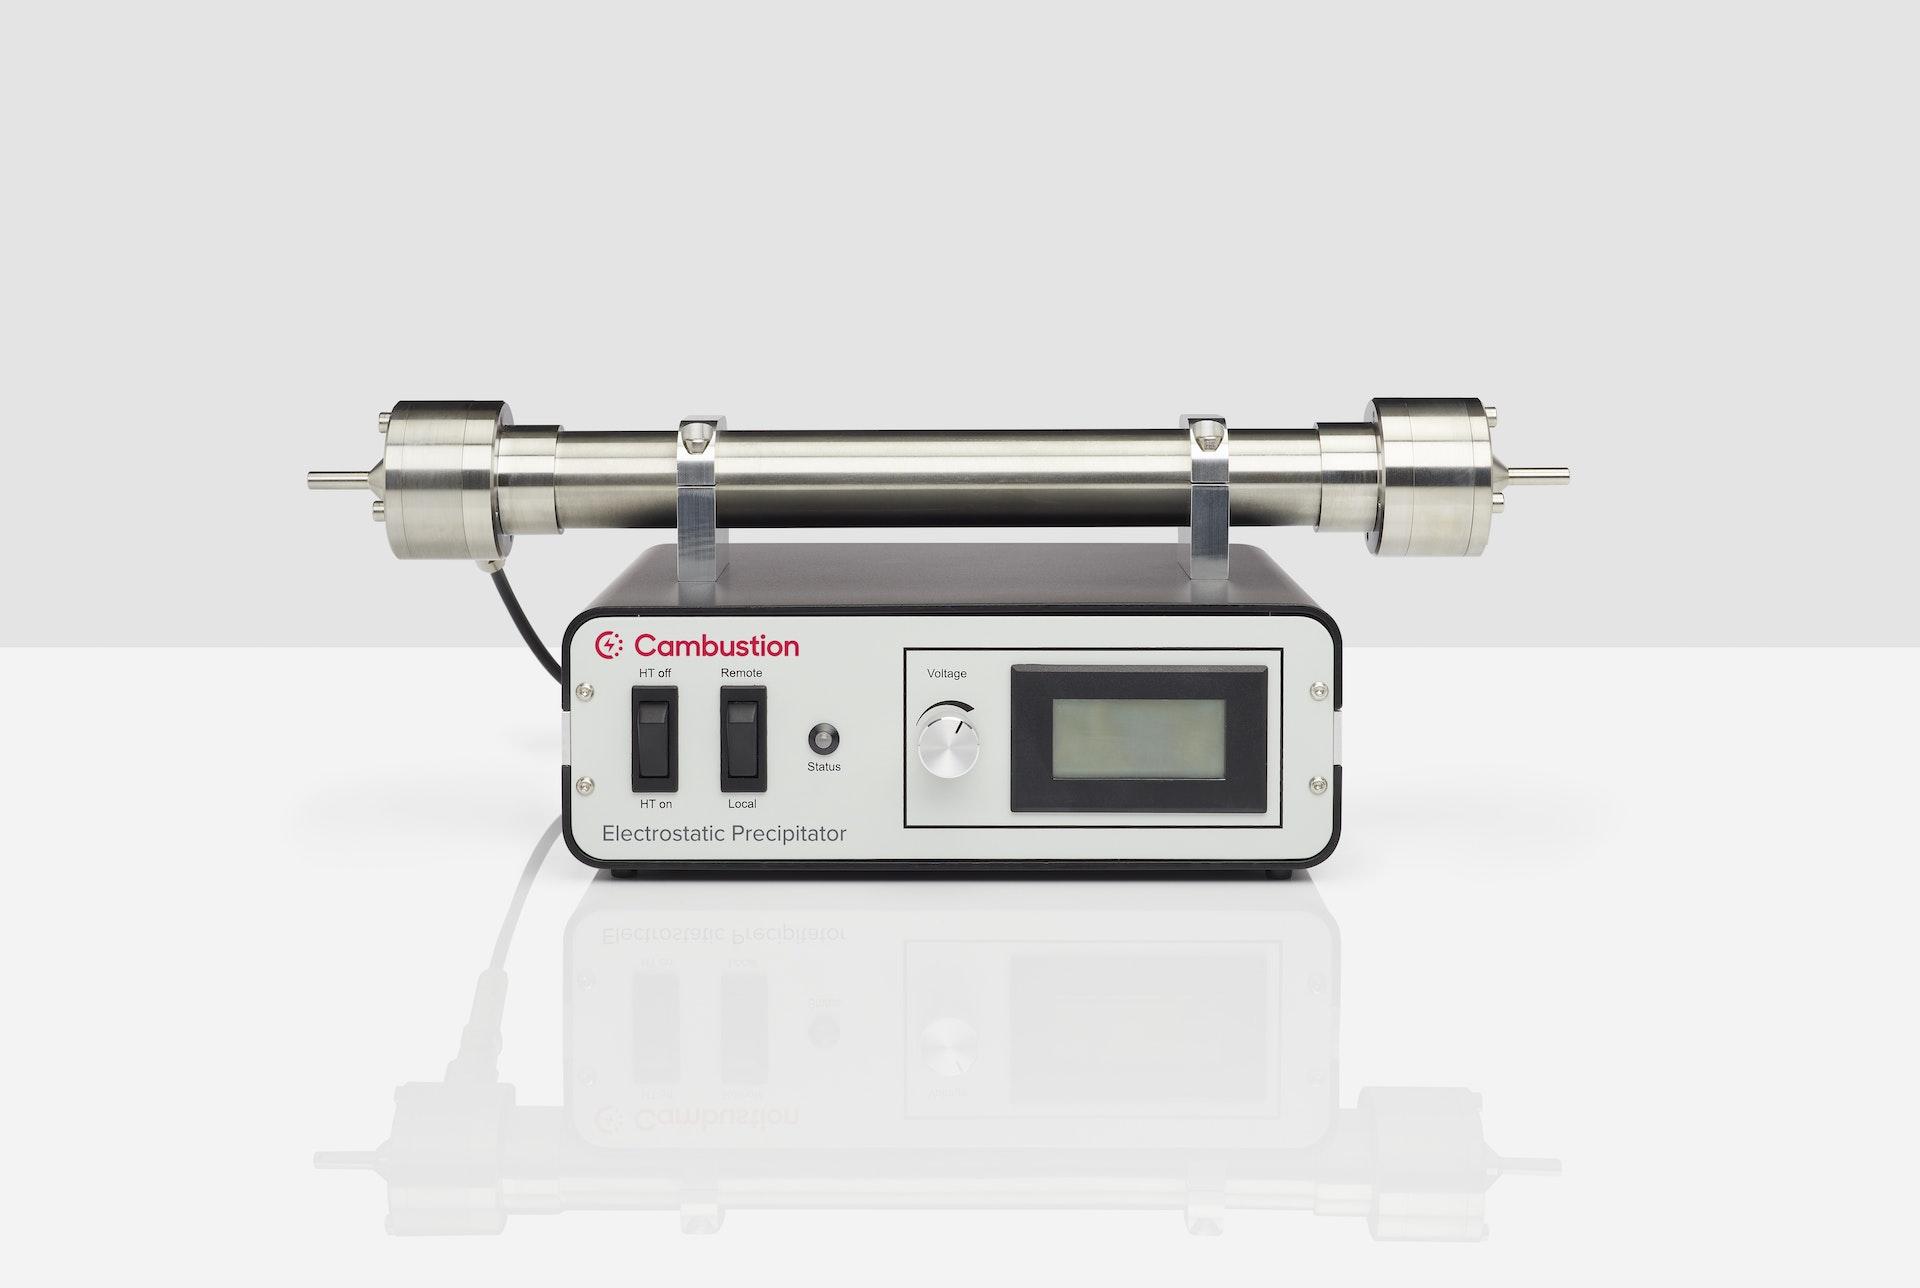 Cambustion electrostatic precipitator